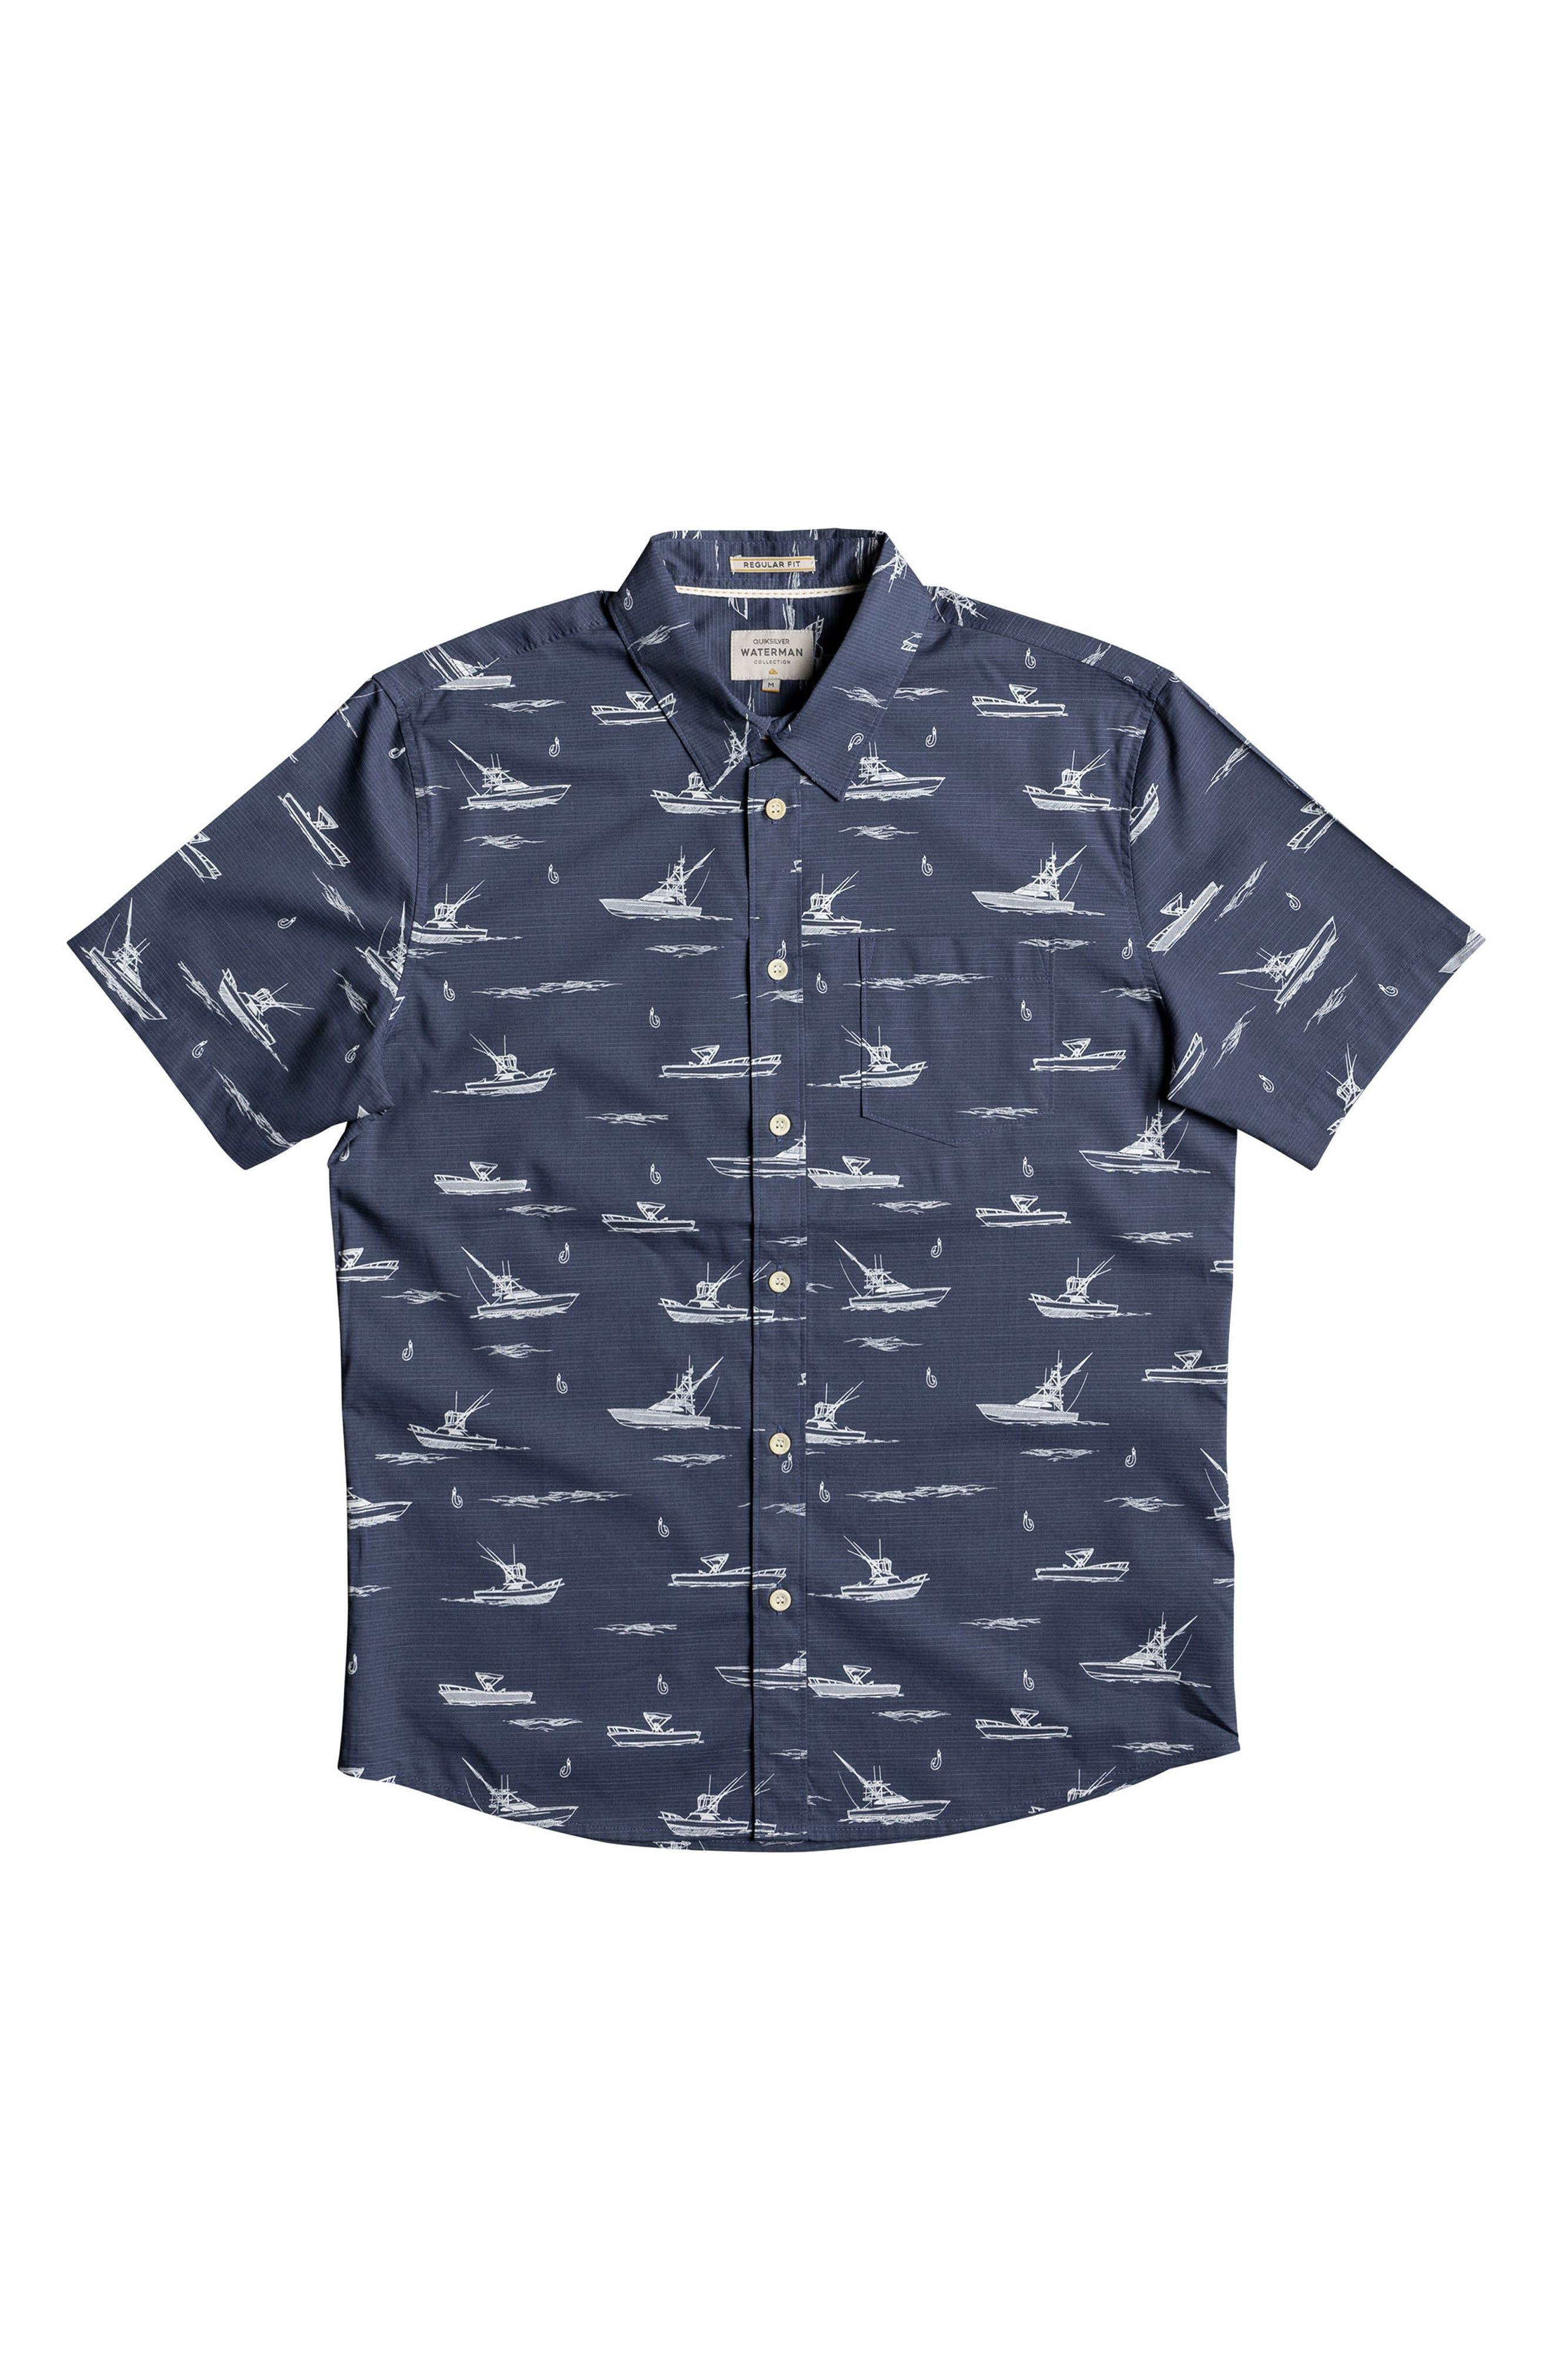 Fishboats Sport Shirt,                             Alternate thumbnail 7, color,